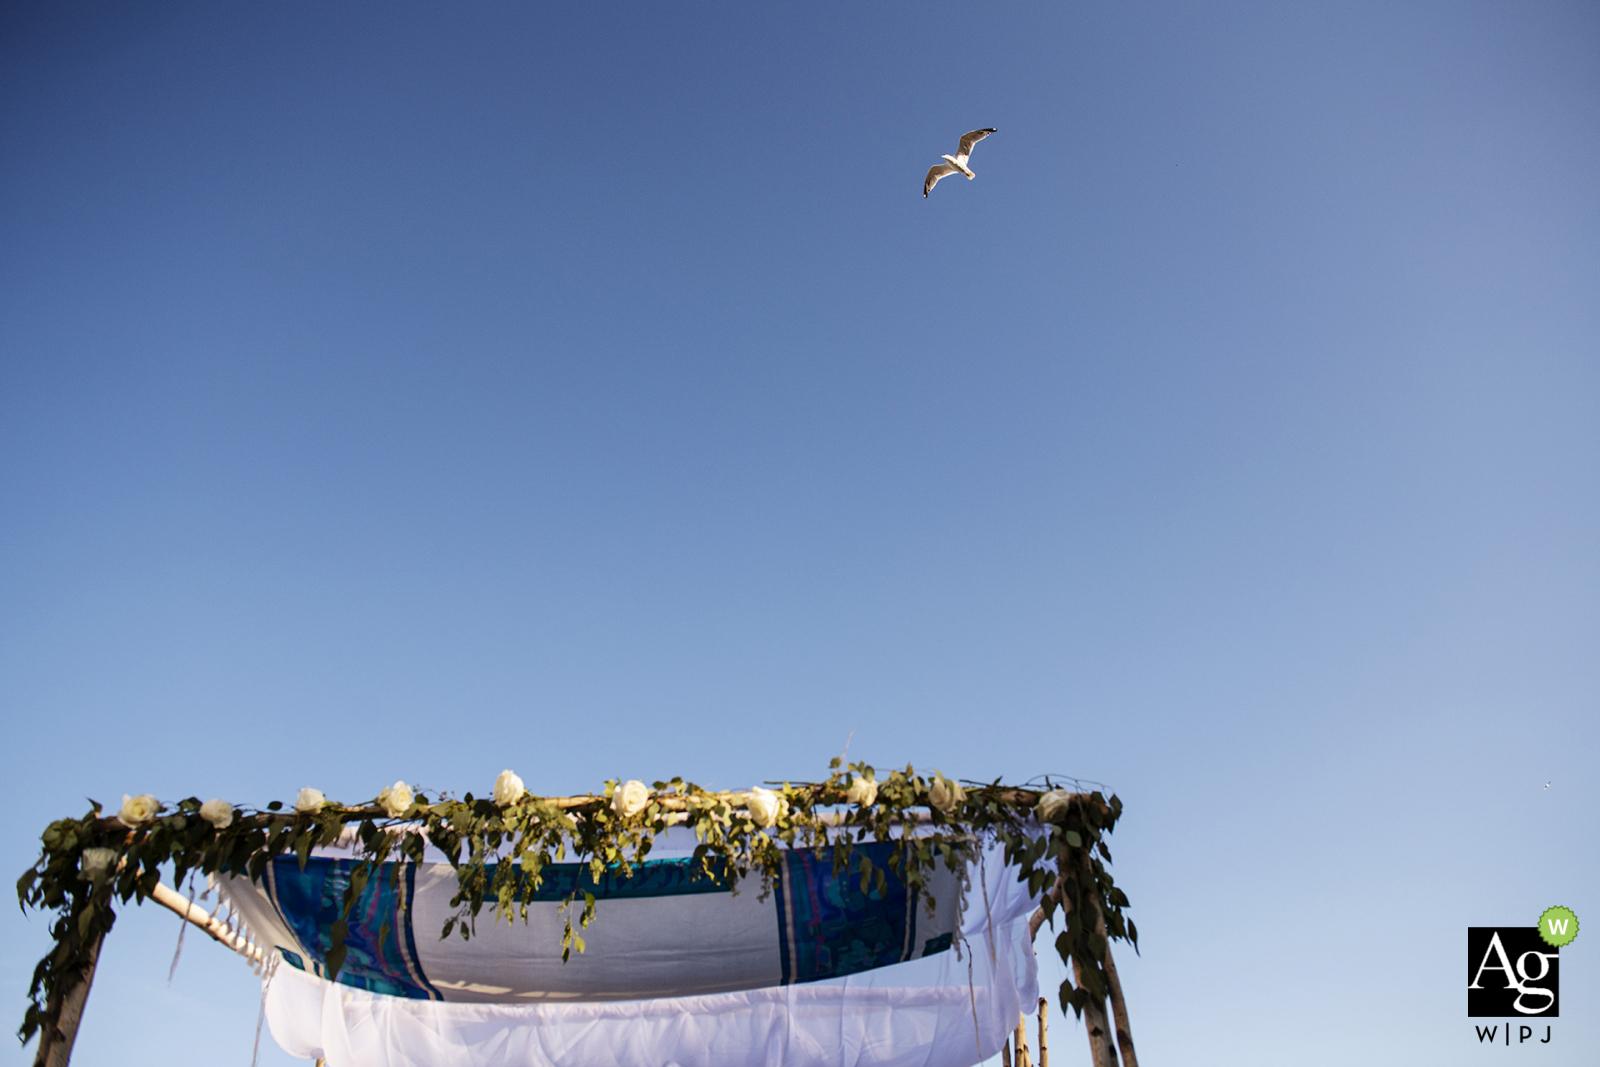 Oceanview - Nahant, Massachusetts outdoor wedding venue photo | Bird flying over chuppah during ceremony